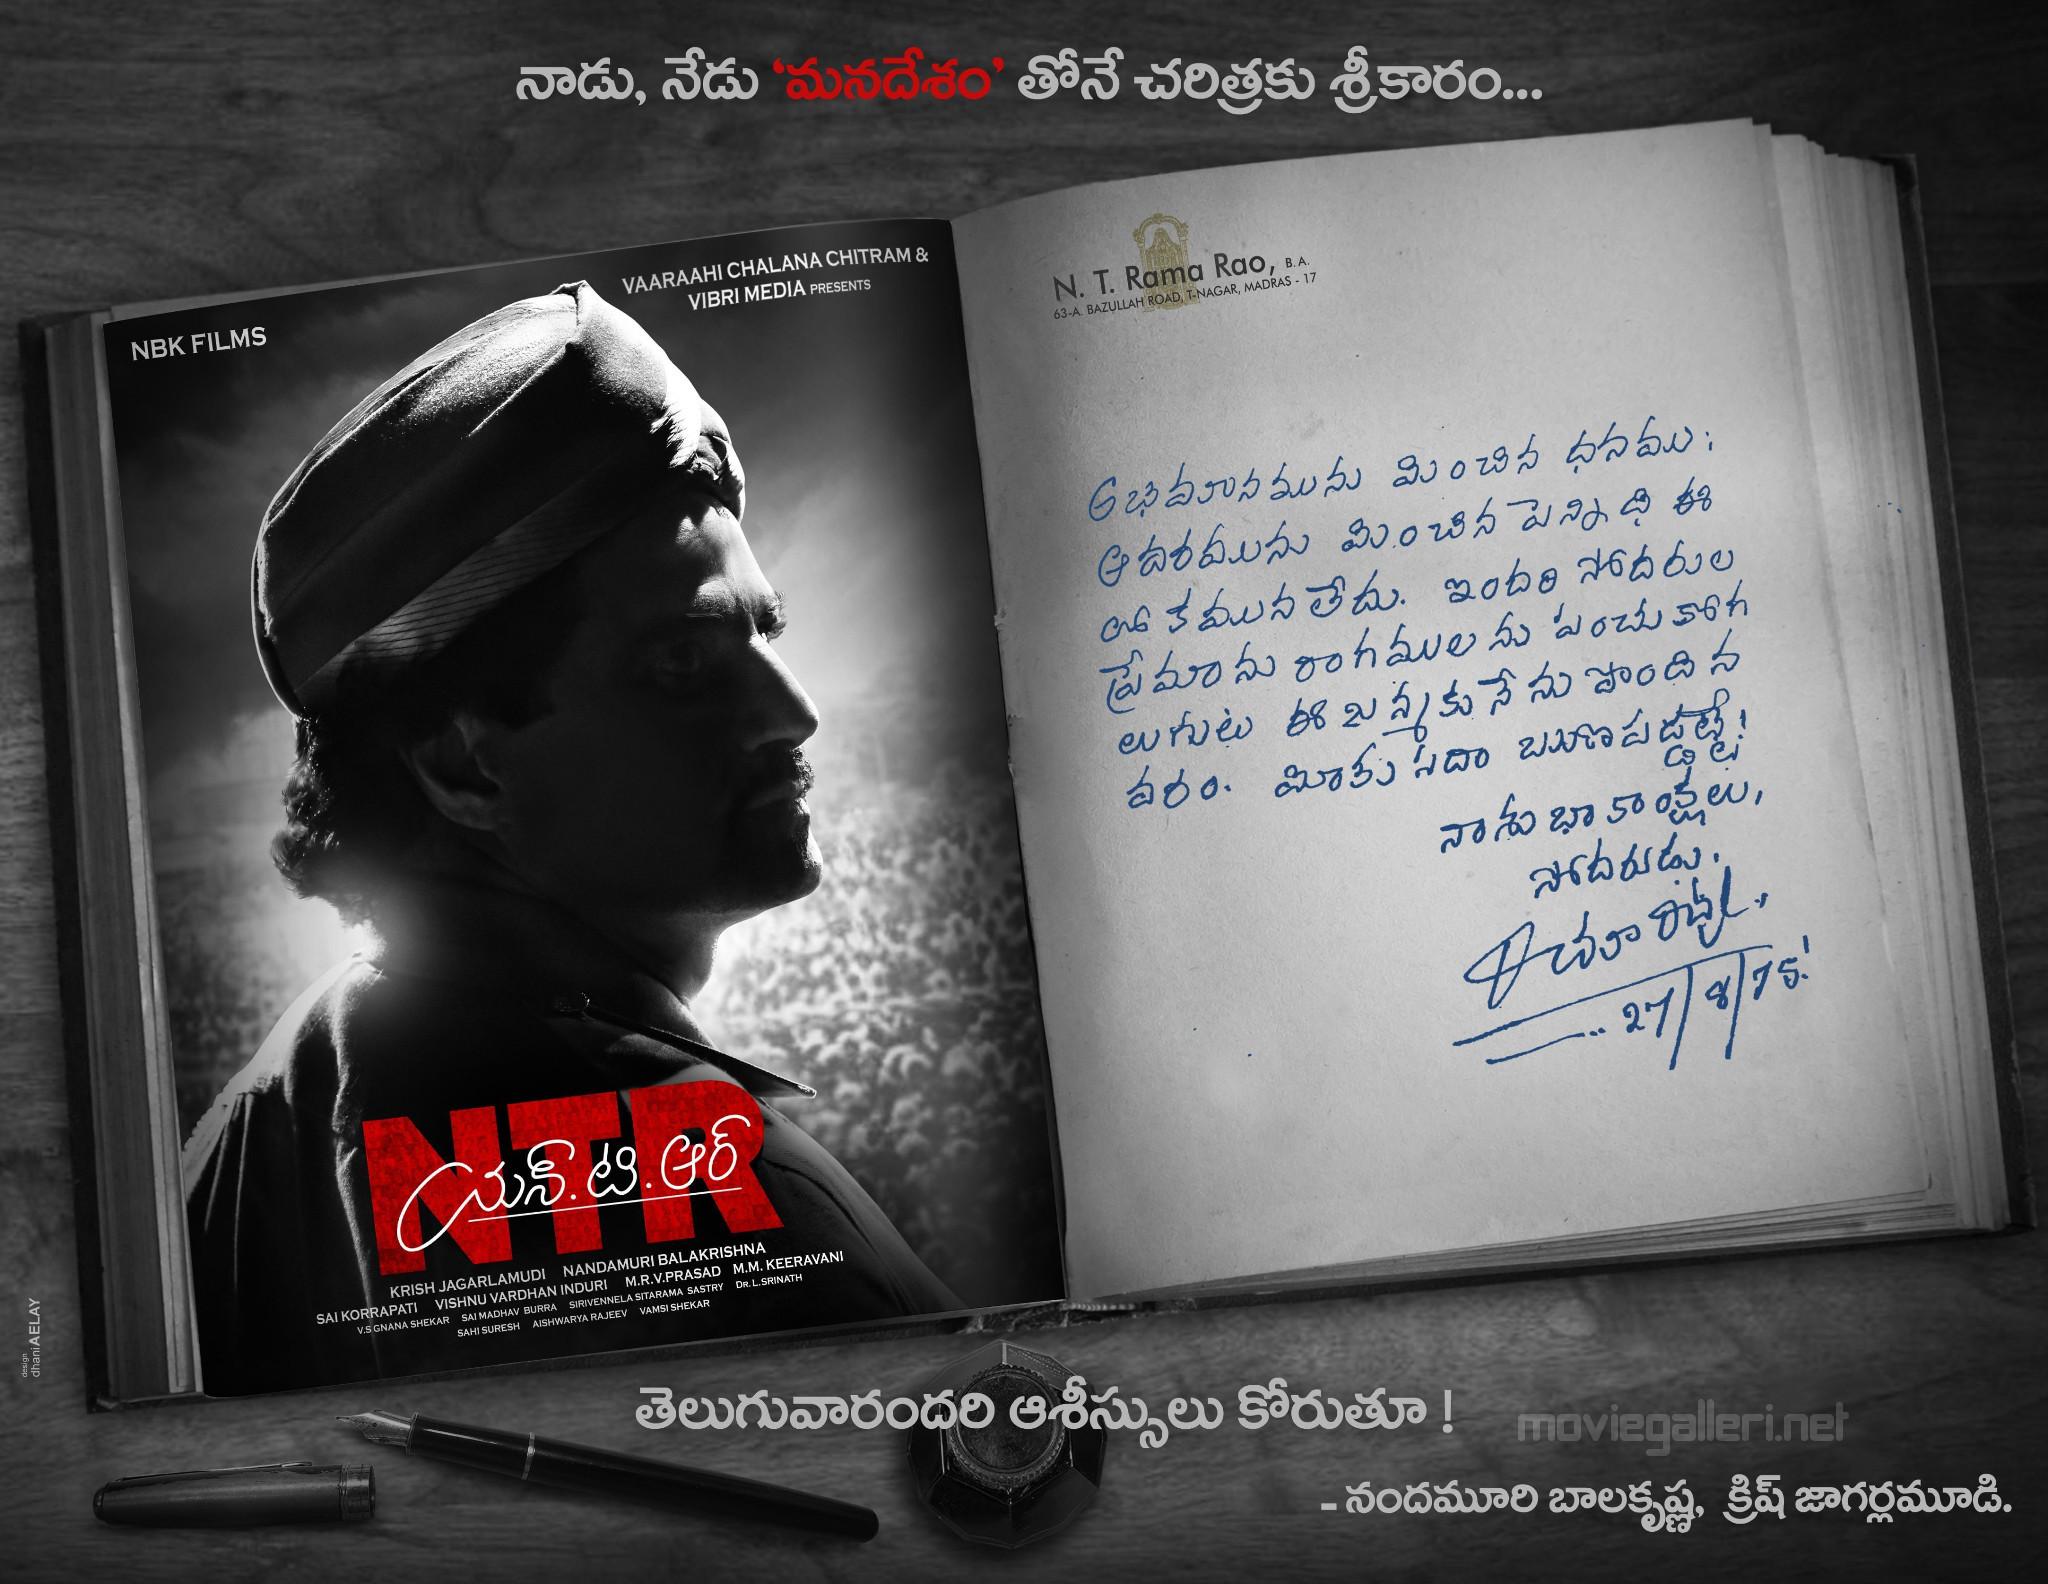 Nandamuri Balakrishna NTR Biopic Movie New Poster HD